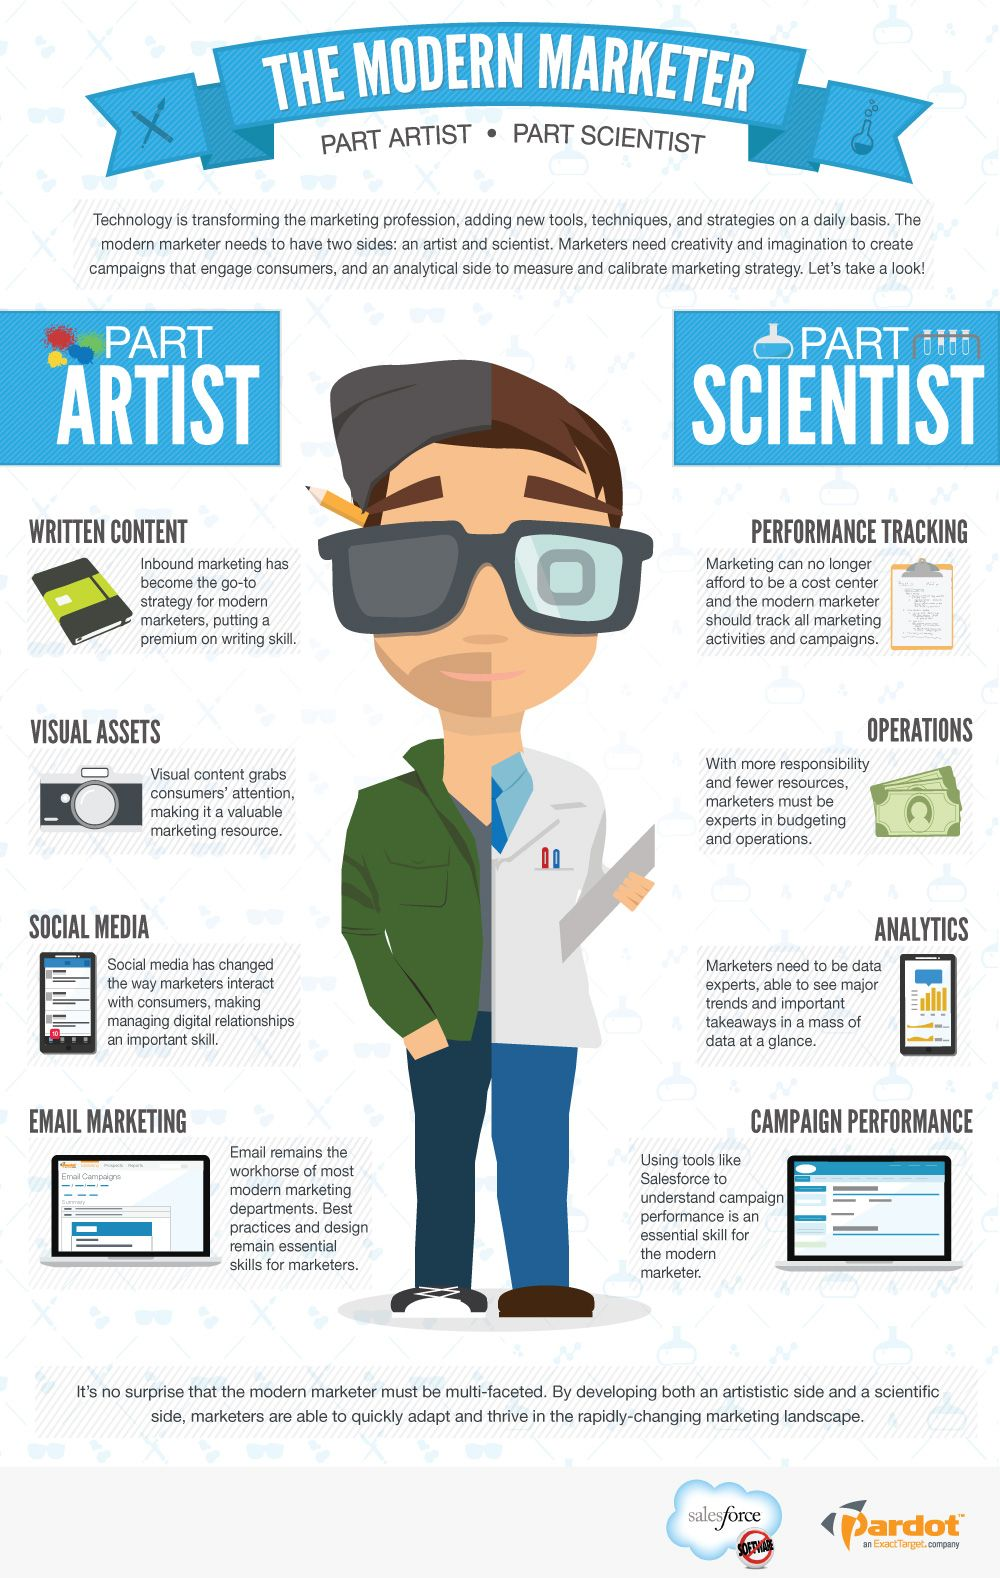 Modern Marketing In The Digital Age - SEO.com